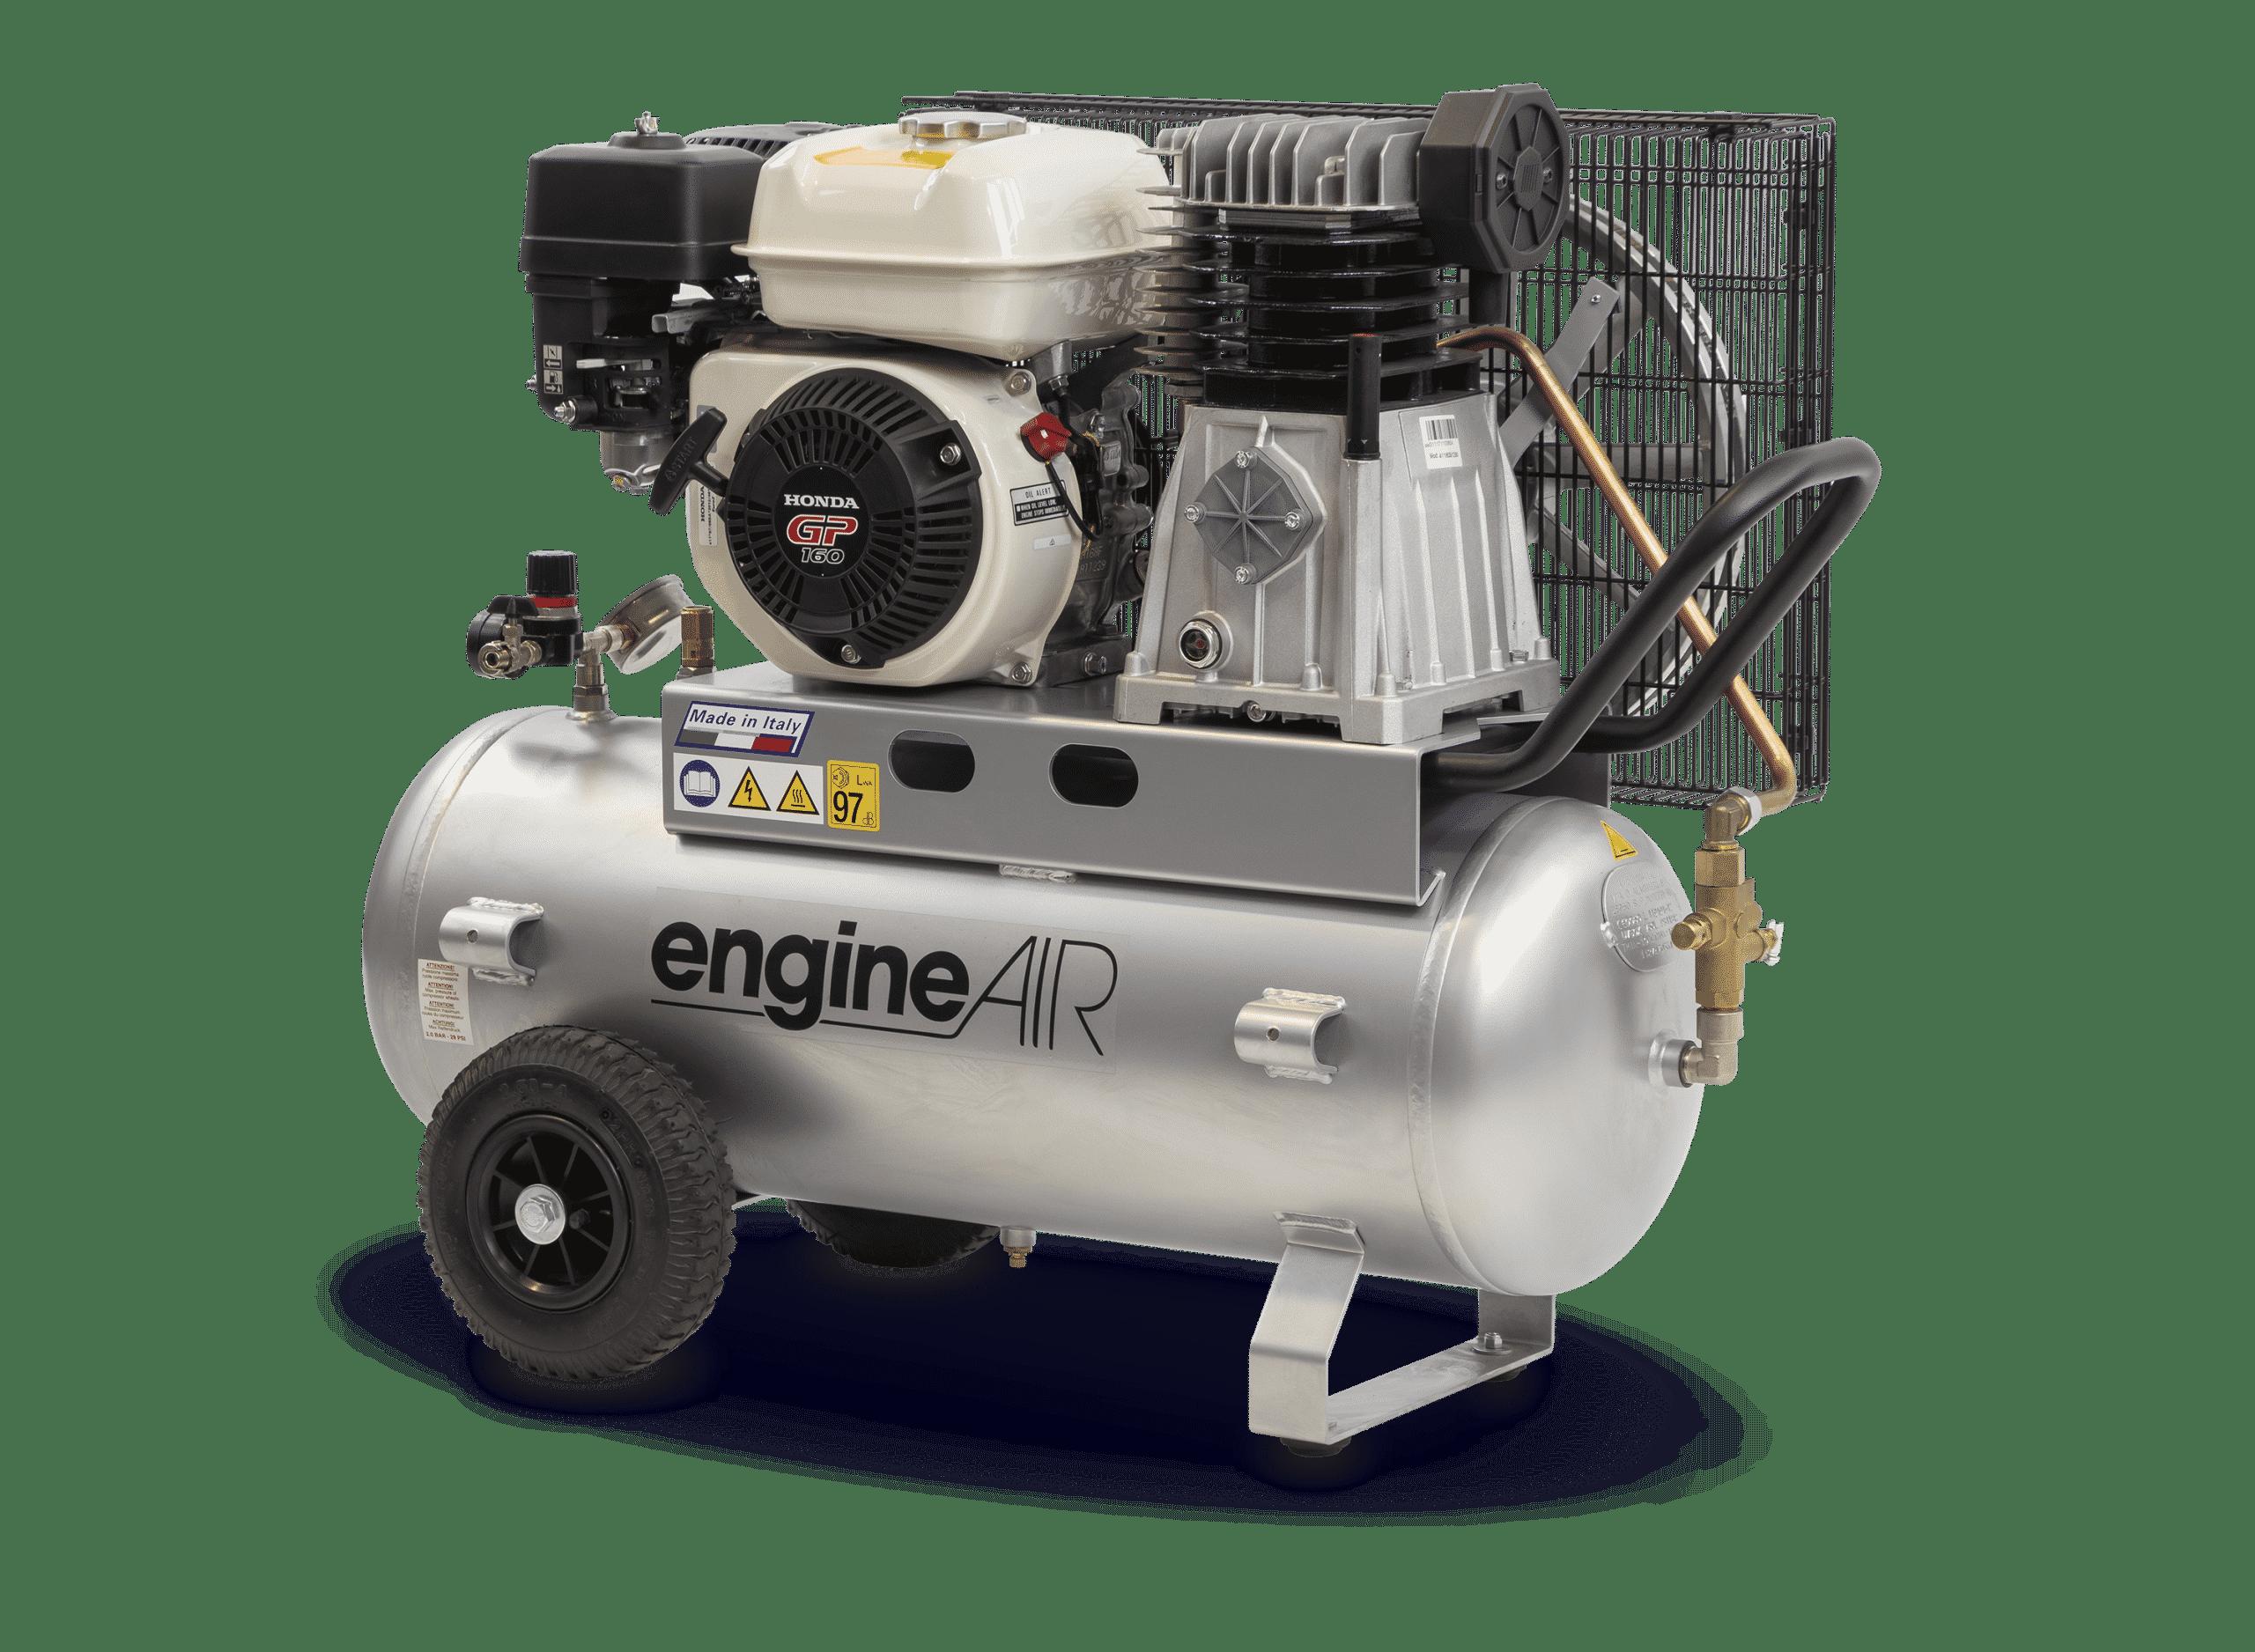 engineAIR 5/50 10